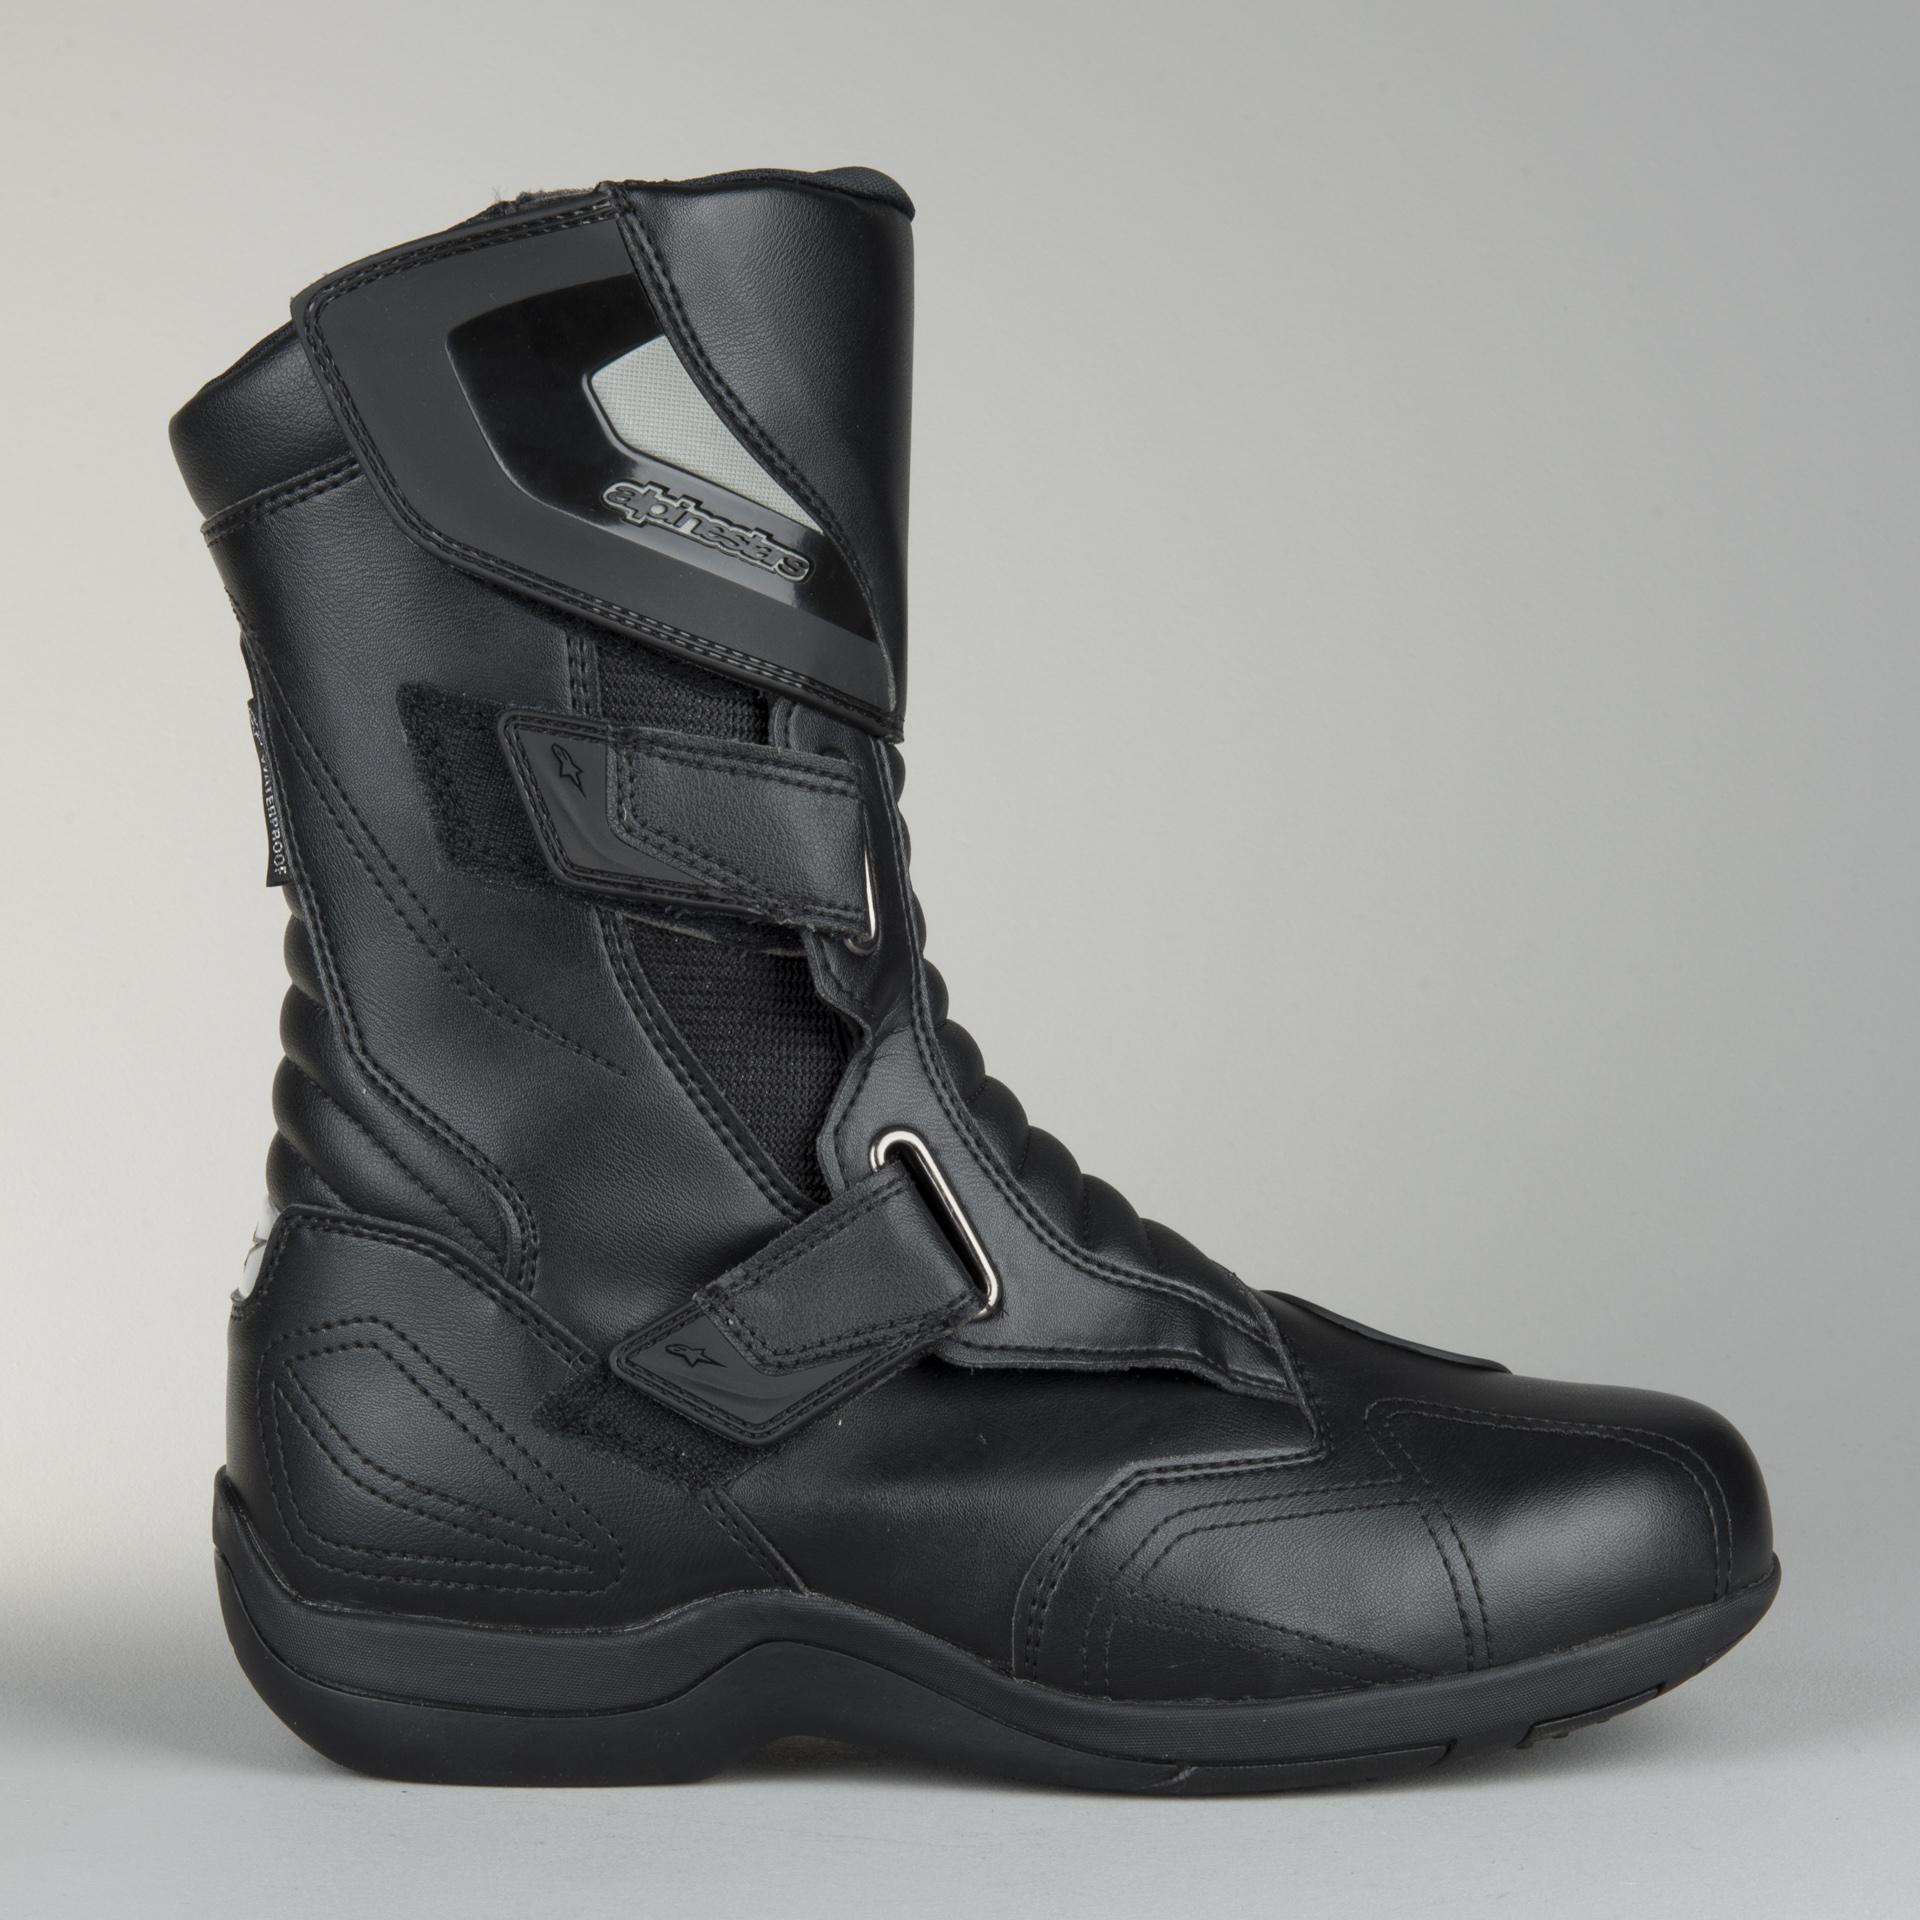 Stivali Alpinestars Roam 2 Waterproof Nero Adesso 25% di